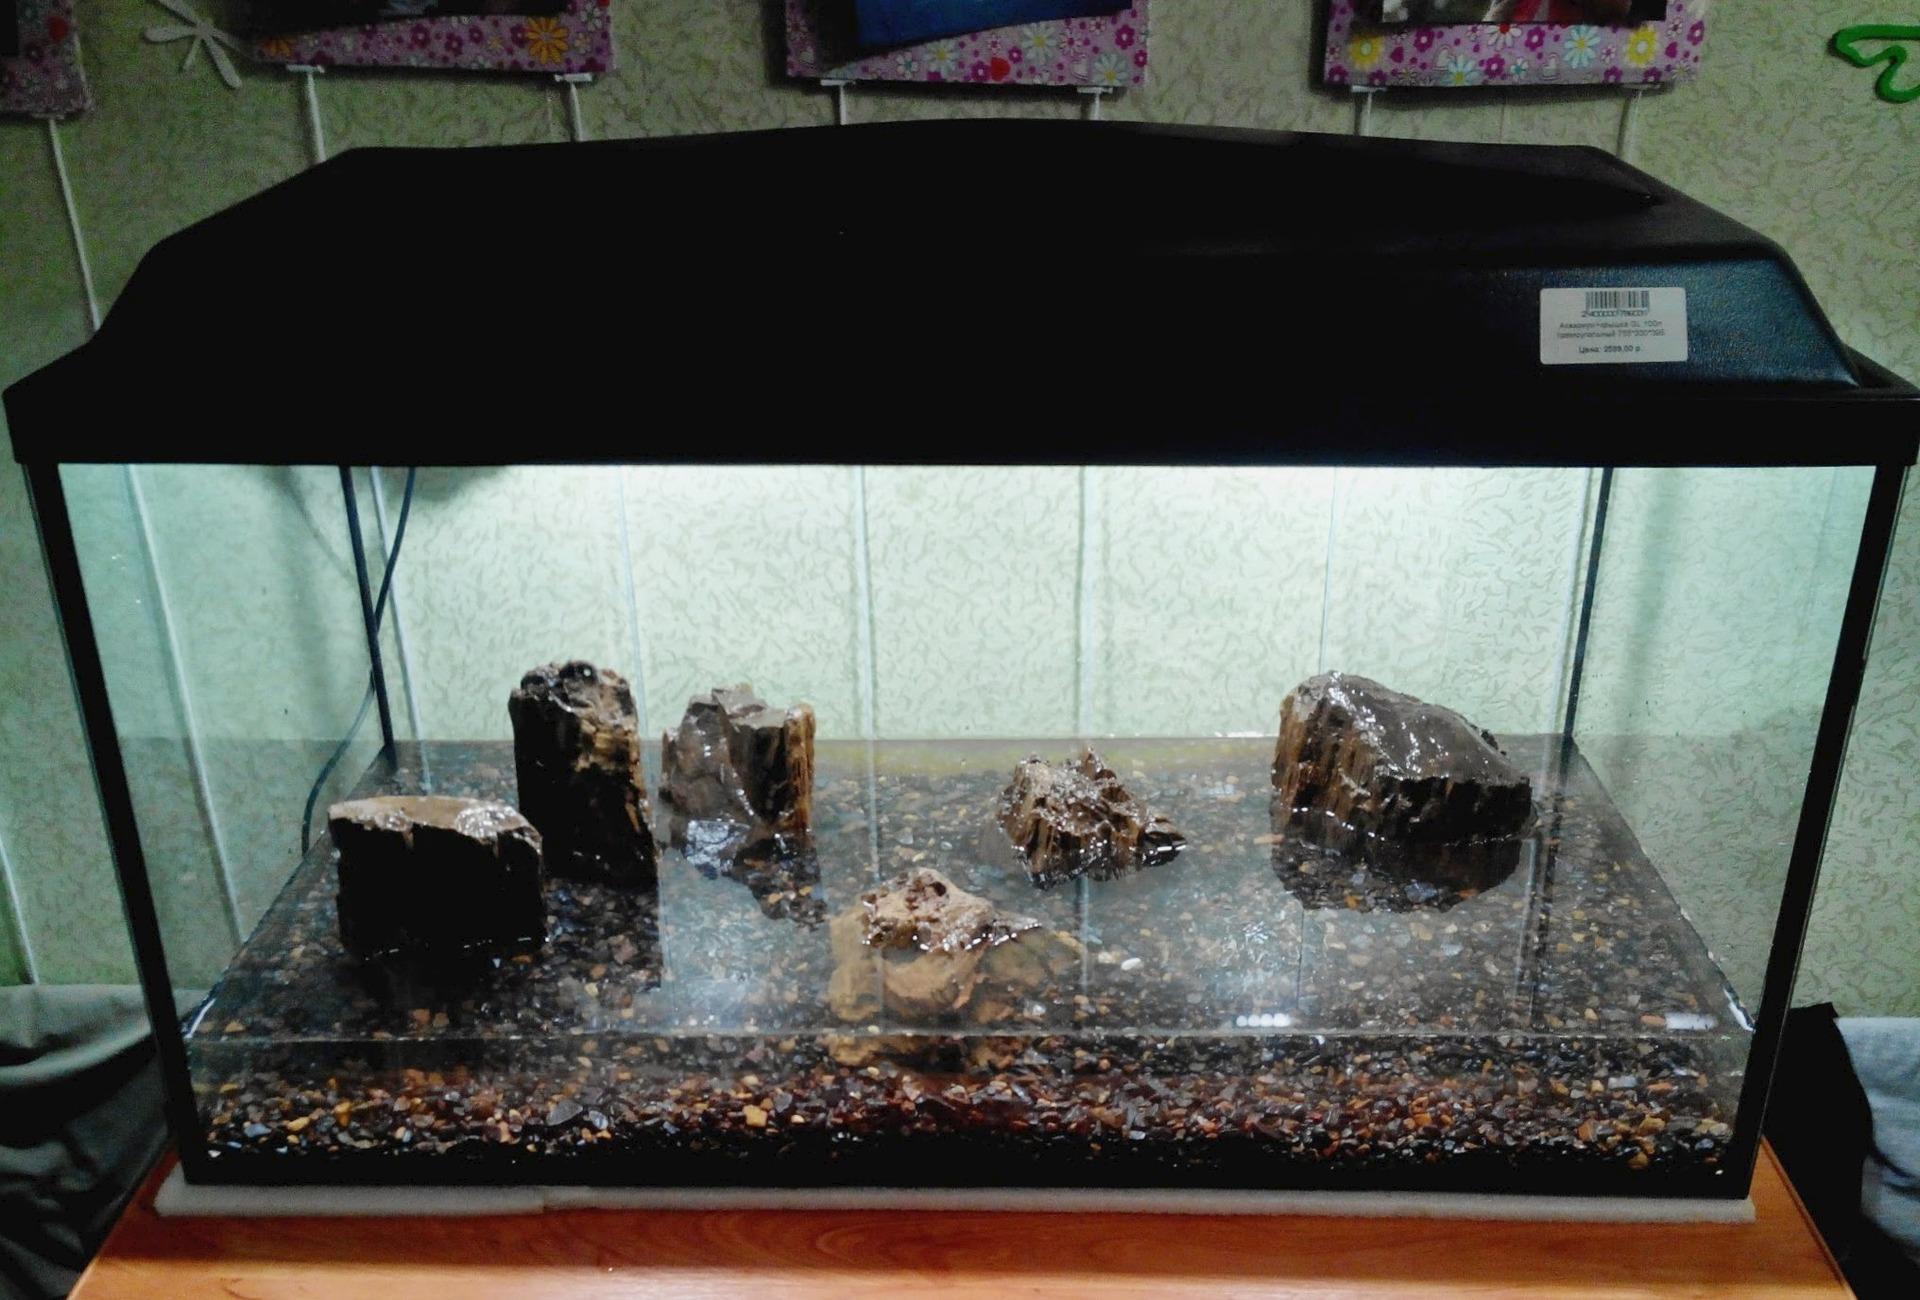 Камни в аквариум своими руками в домашних условиях 62